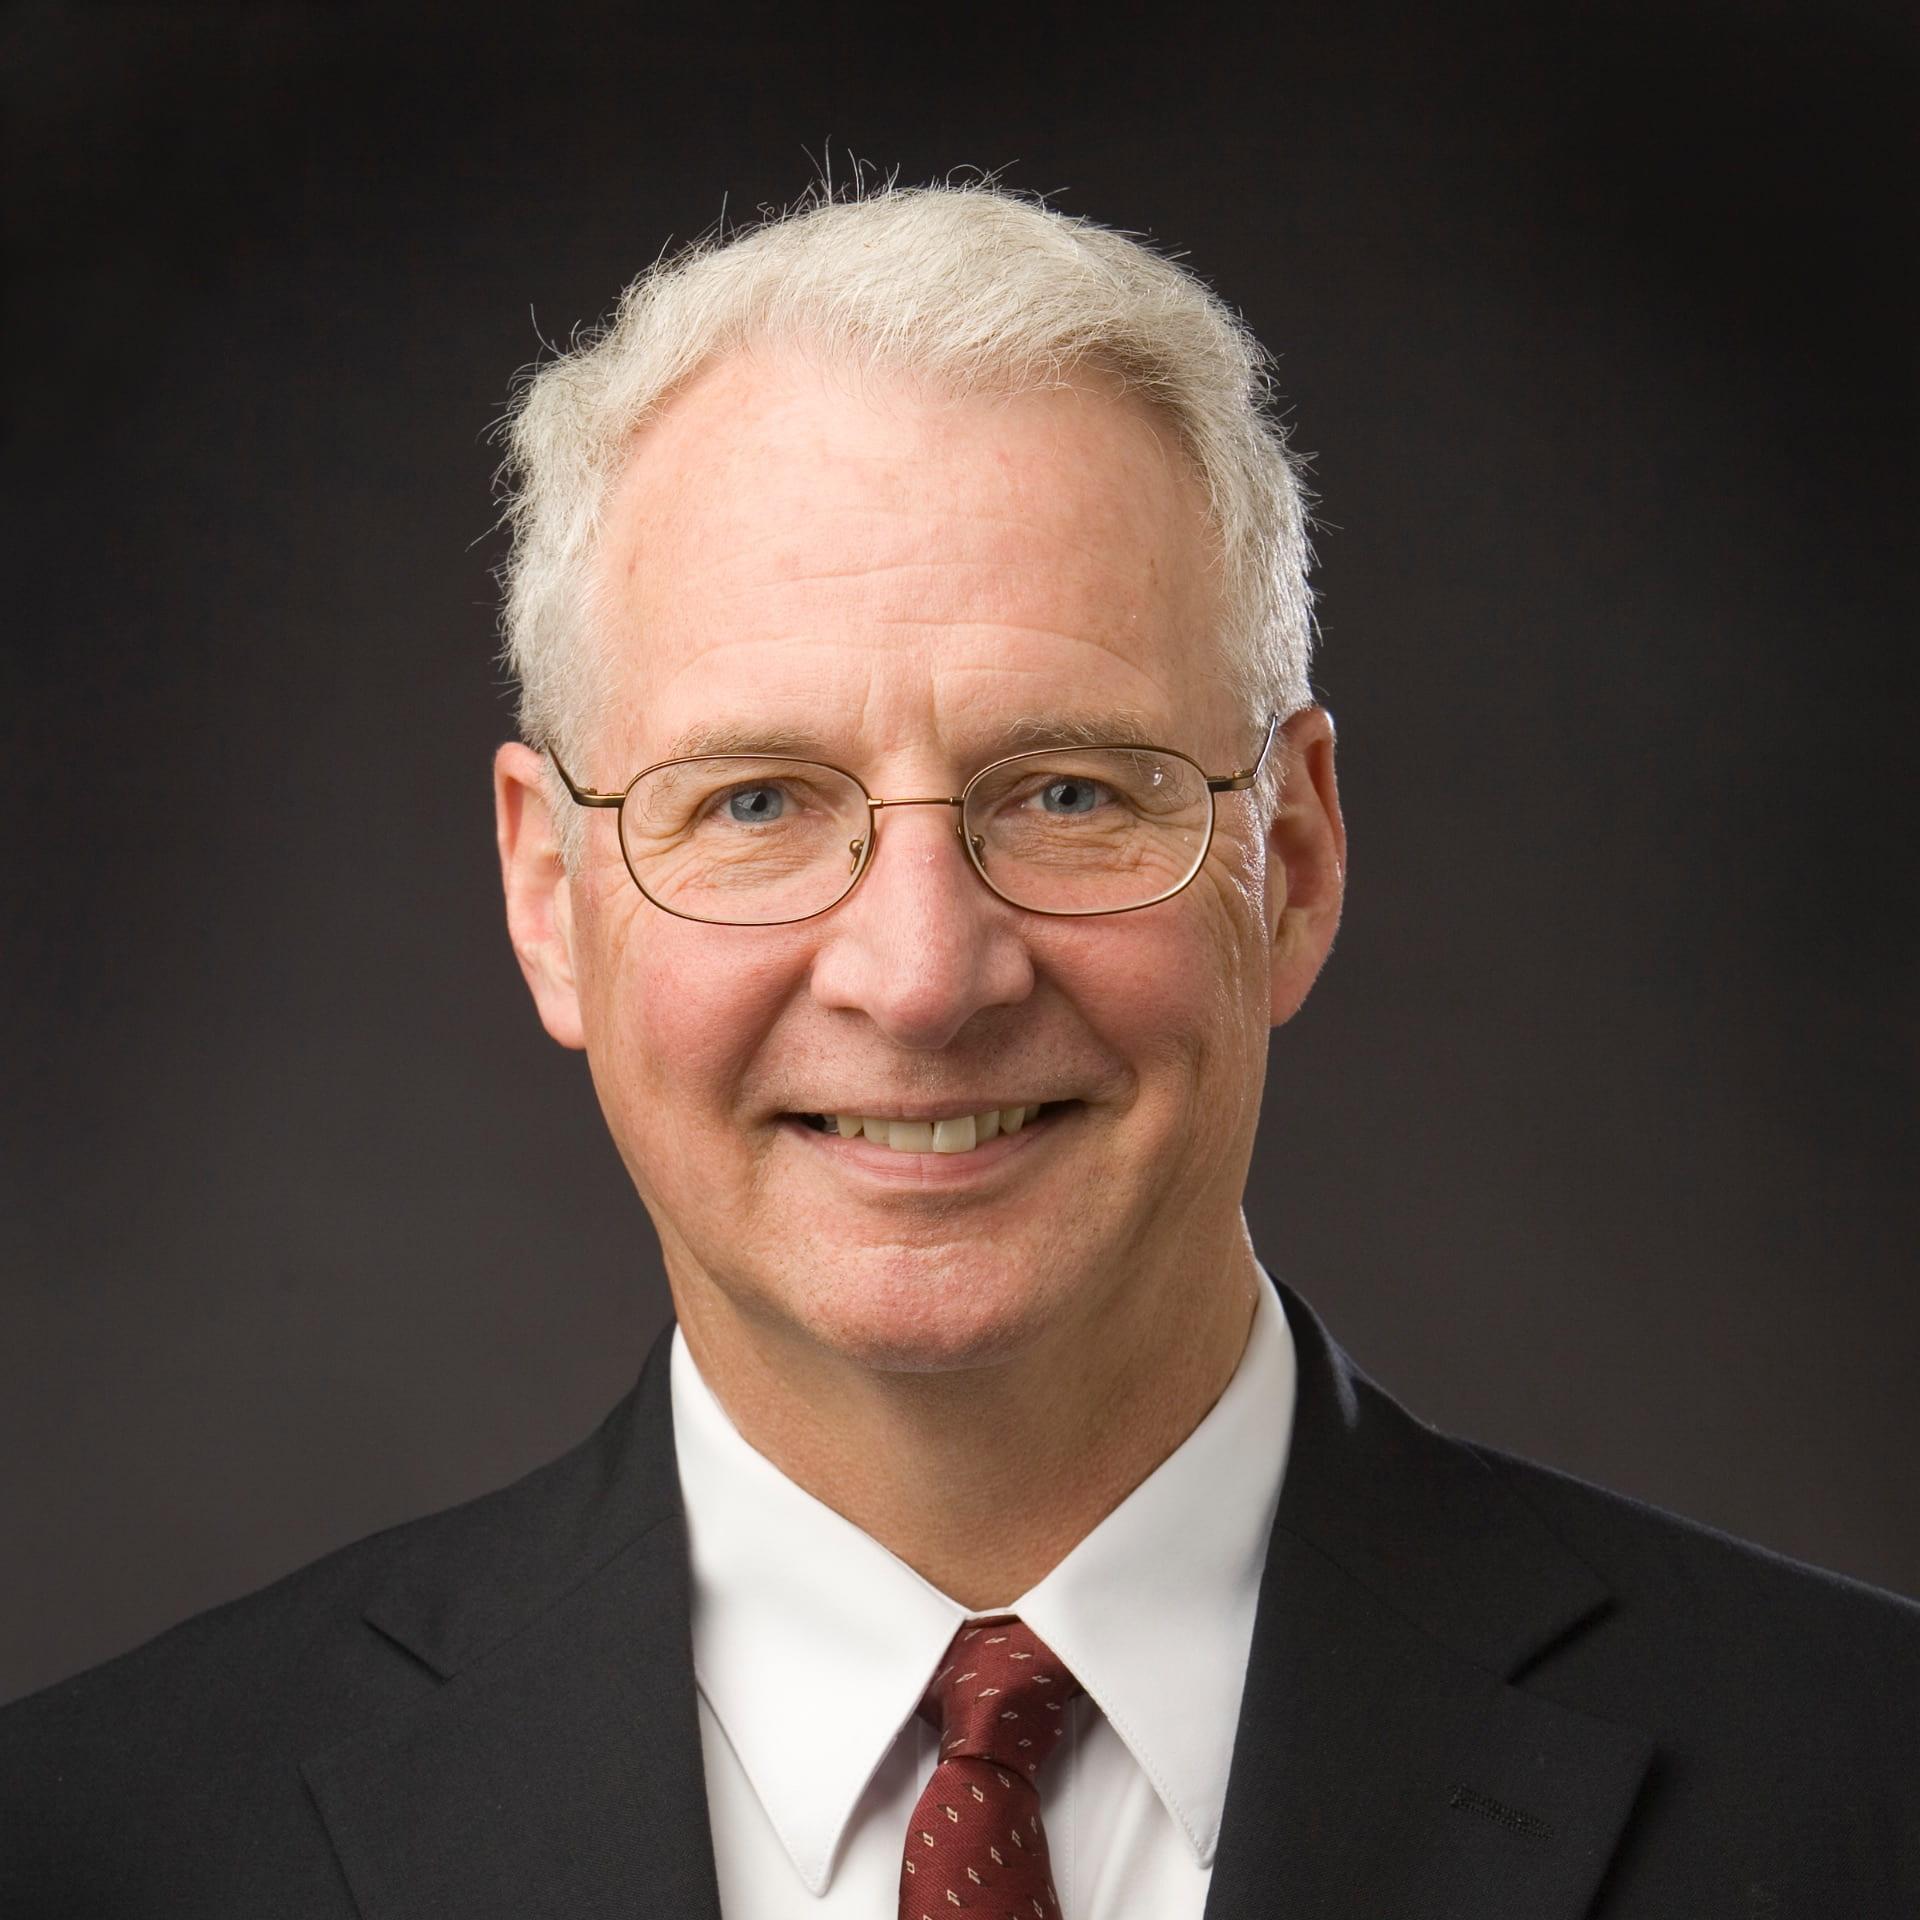 Professor Kenneth Hover